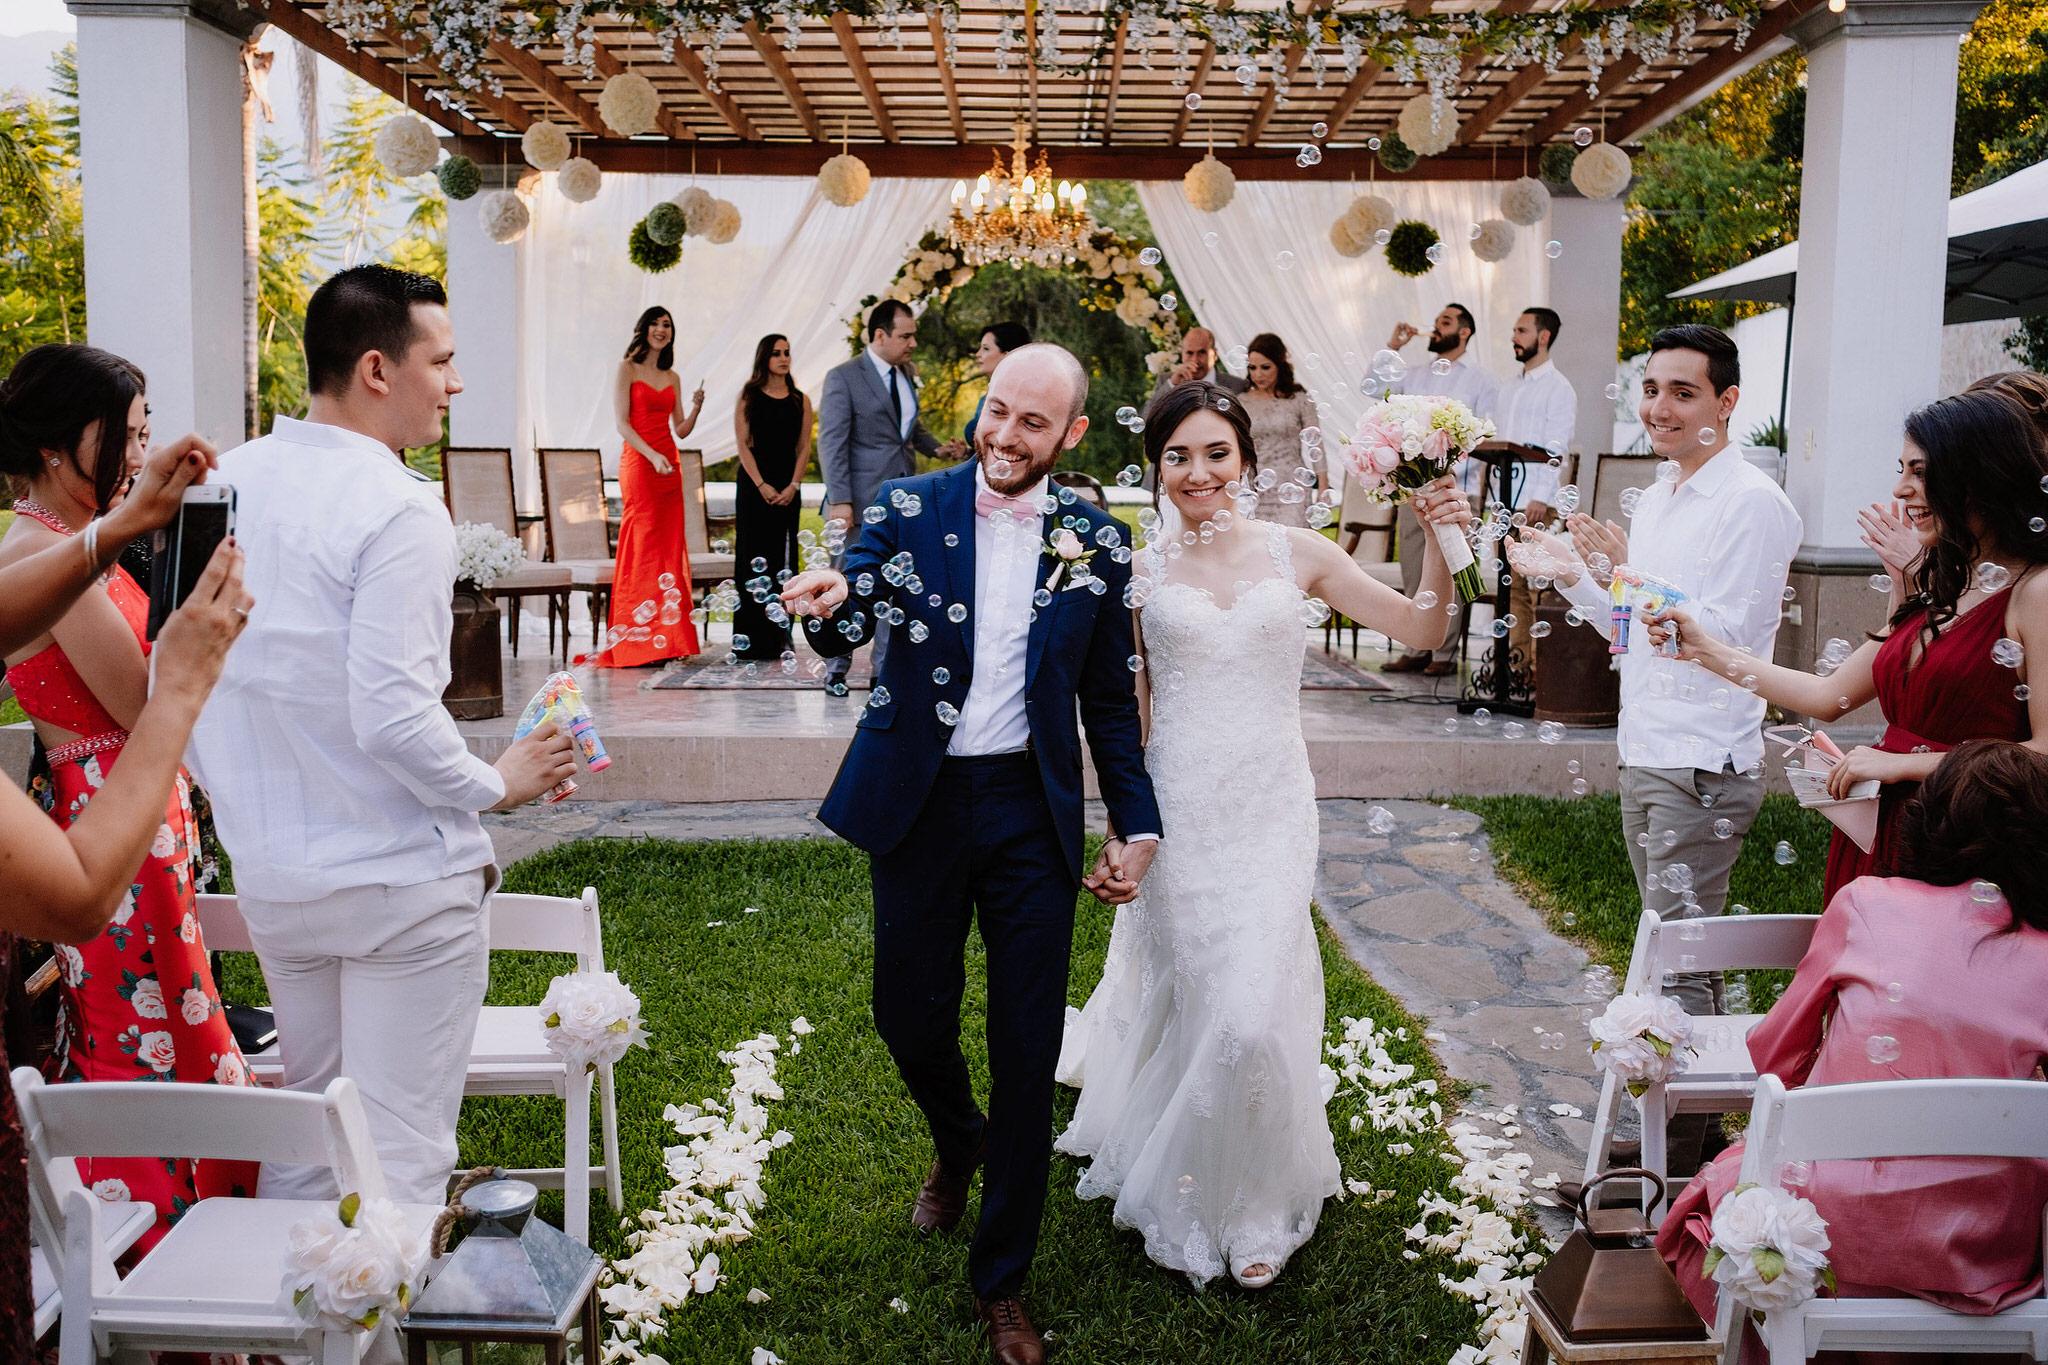 049-Iliana-raymundo-wedding-las-jacarandas-santiago-nl.jpg